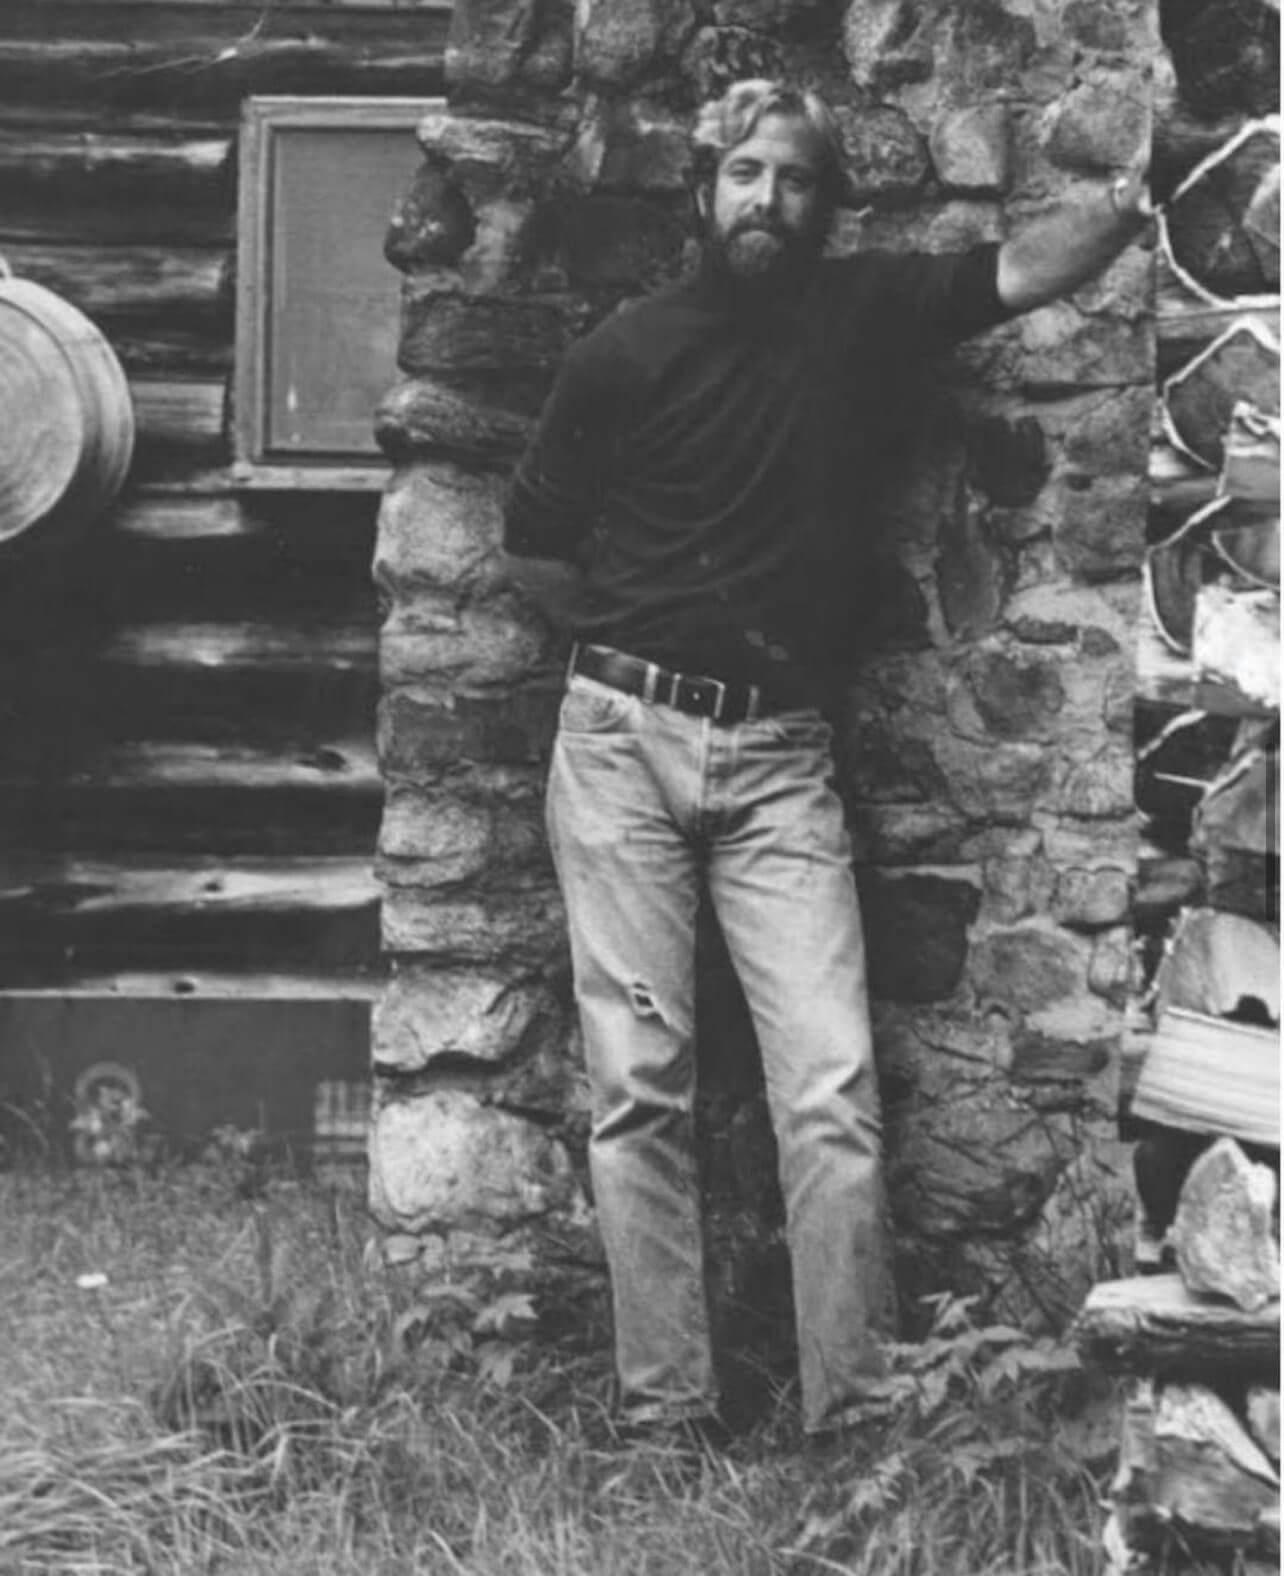 Christopher Shaw, circa early 70s at Jon Cody's cabin in Stony Creek